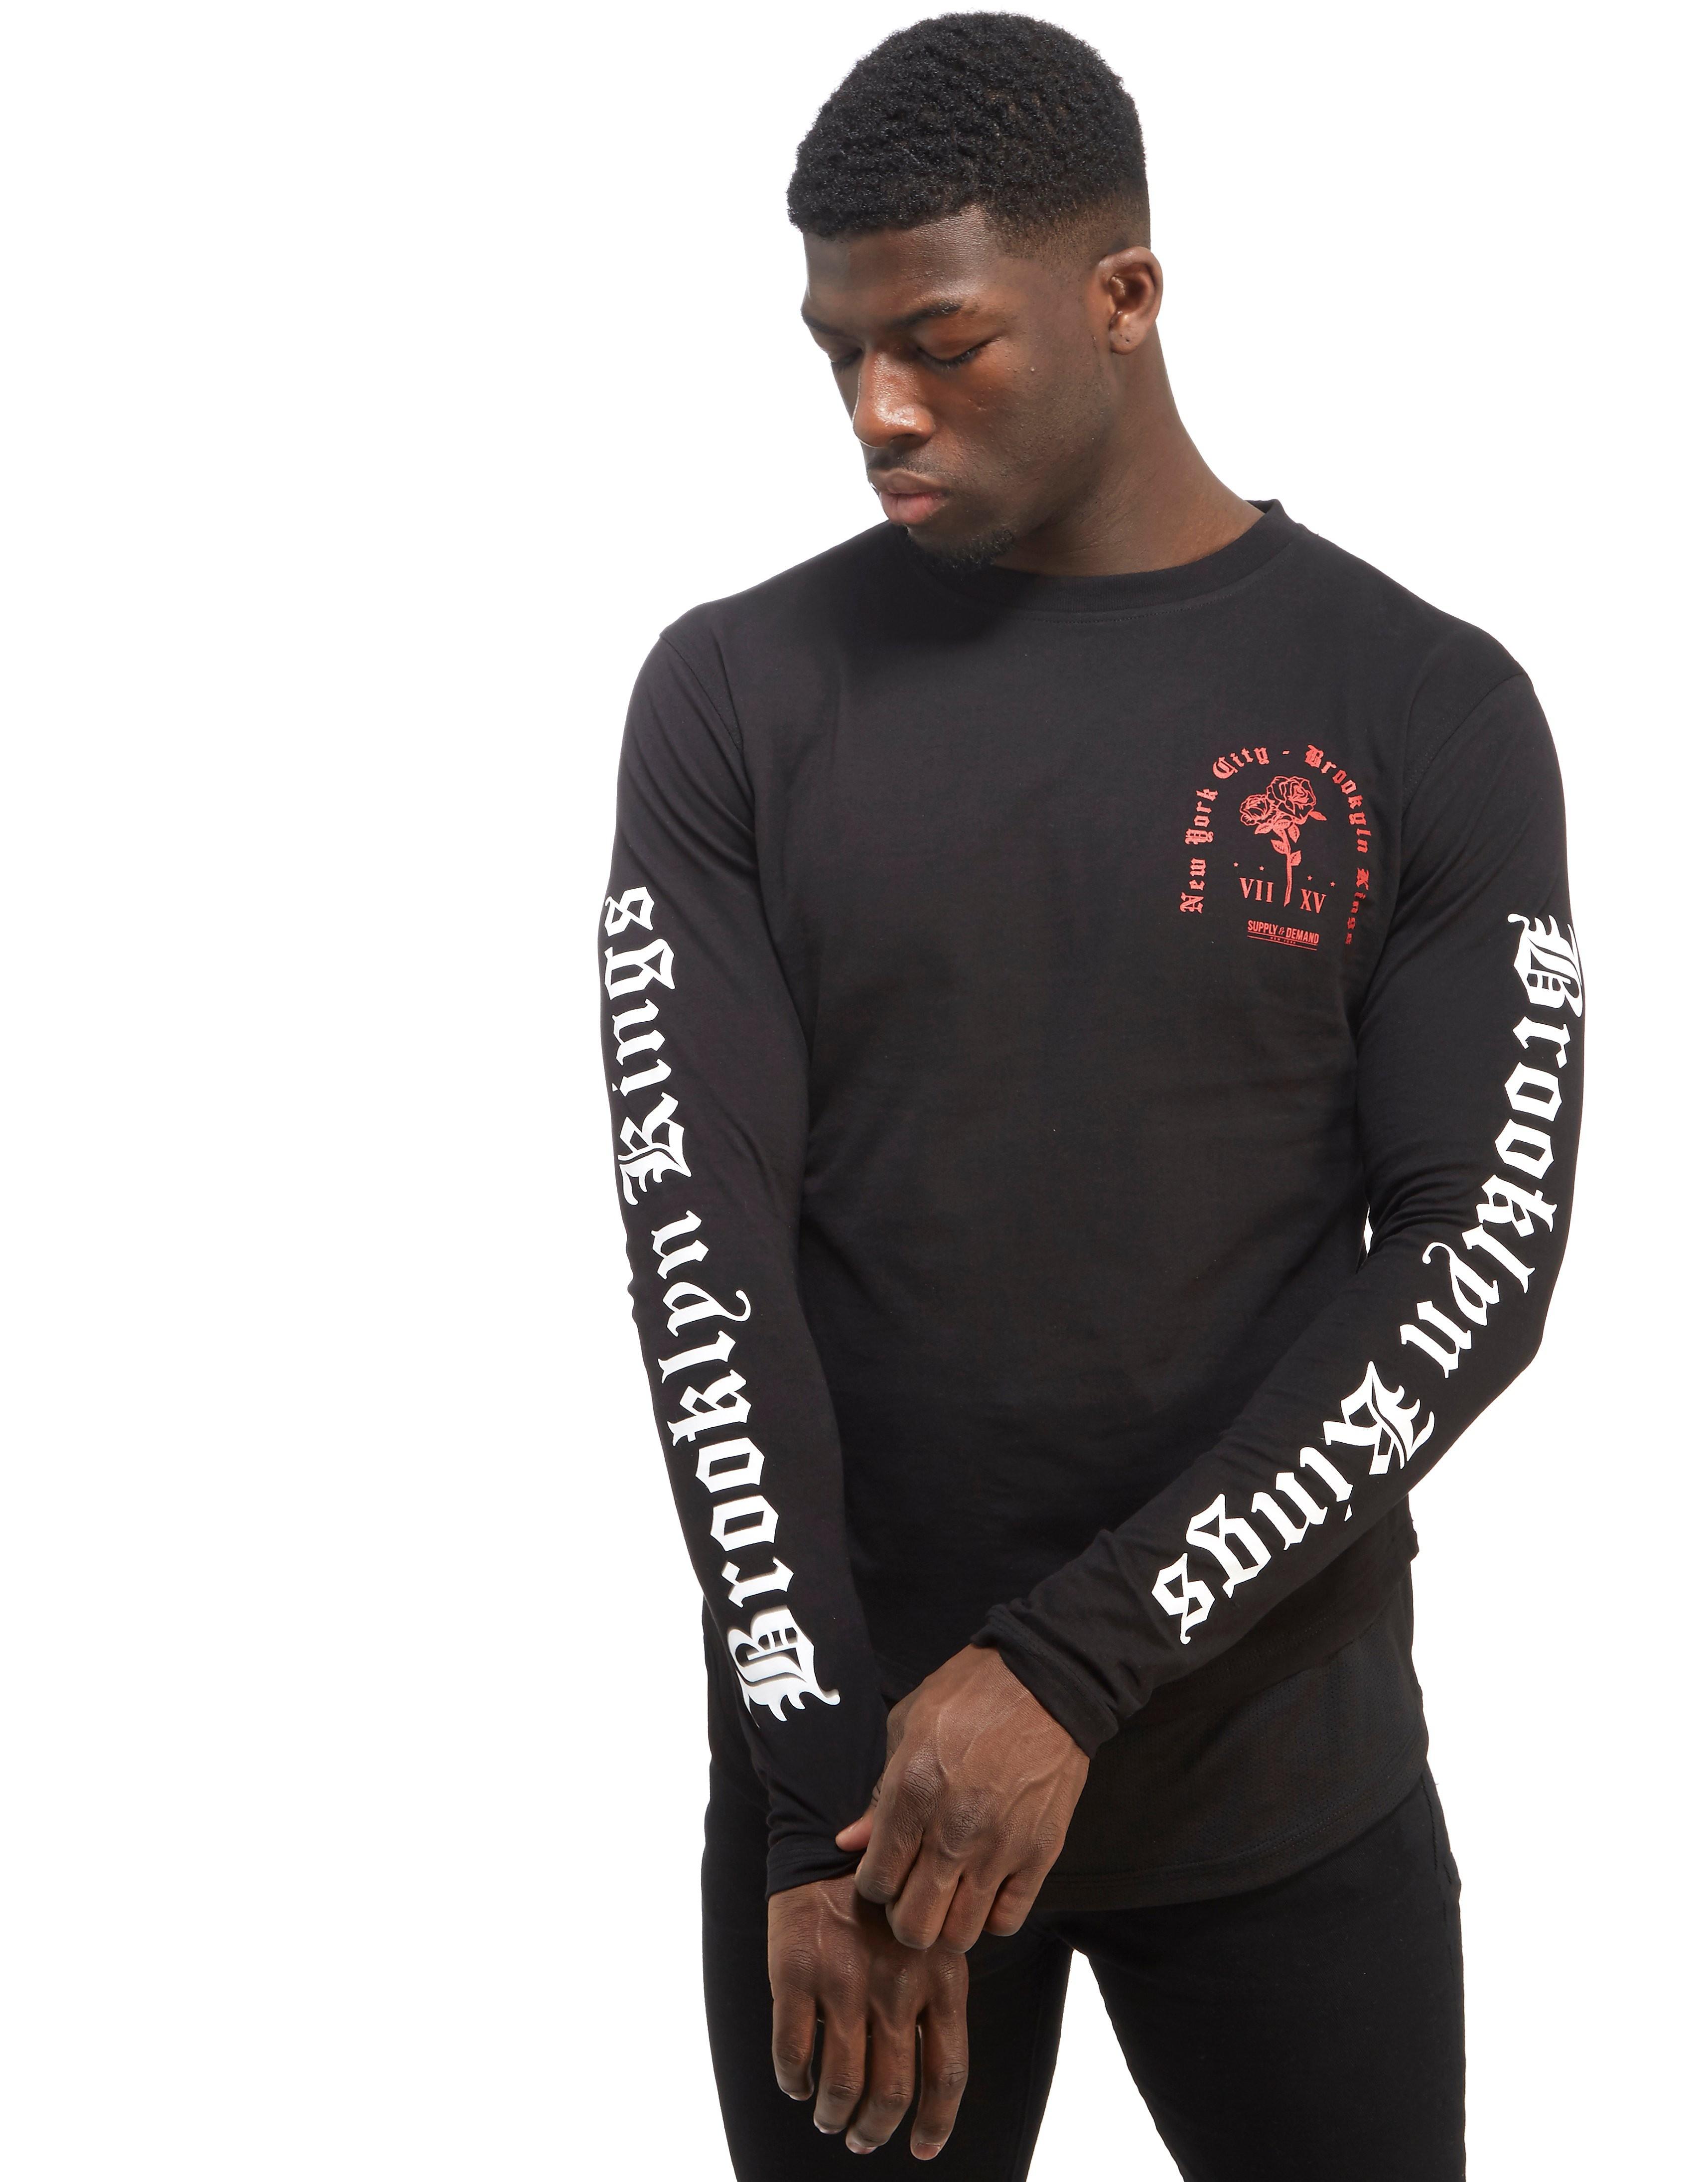 Supply & Demand Romantic Longsleeve T-Shirt